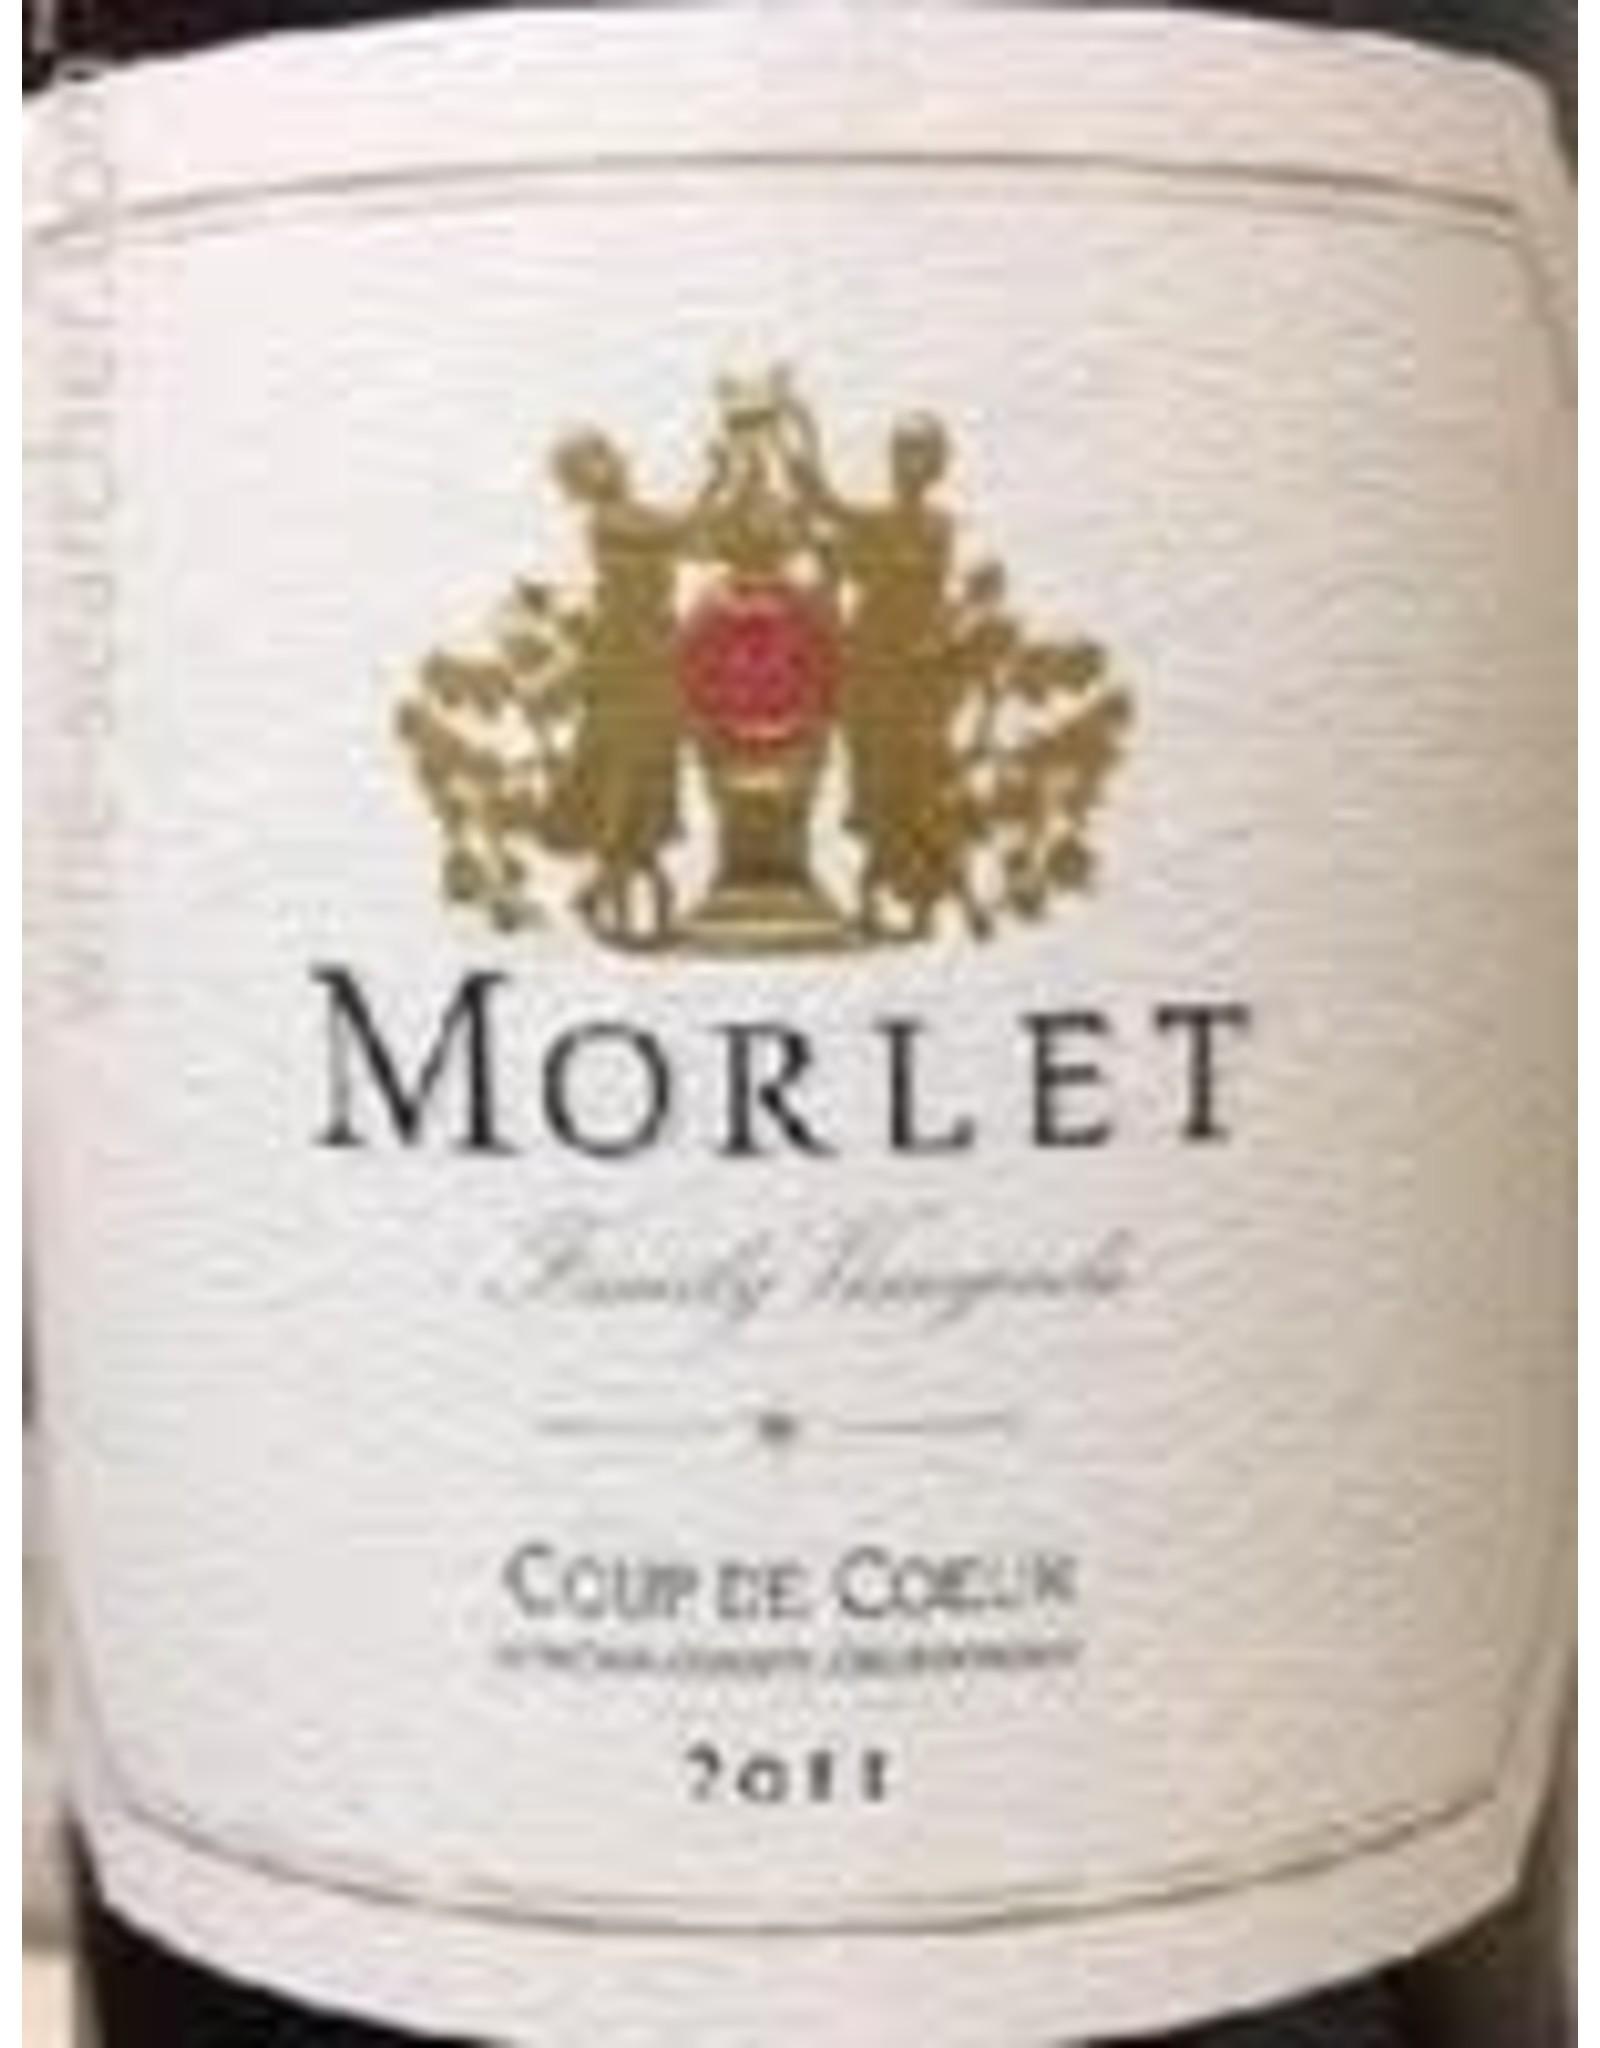 Morlet 'Coup Decoeur' Chardonnay, Sonoma County 2013